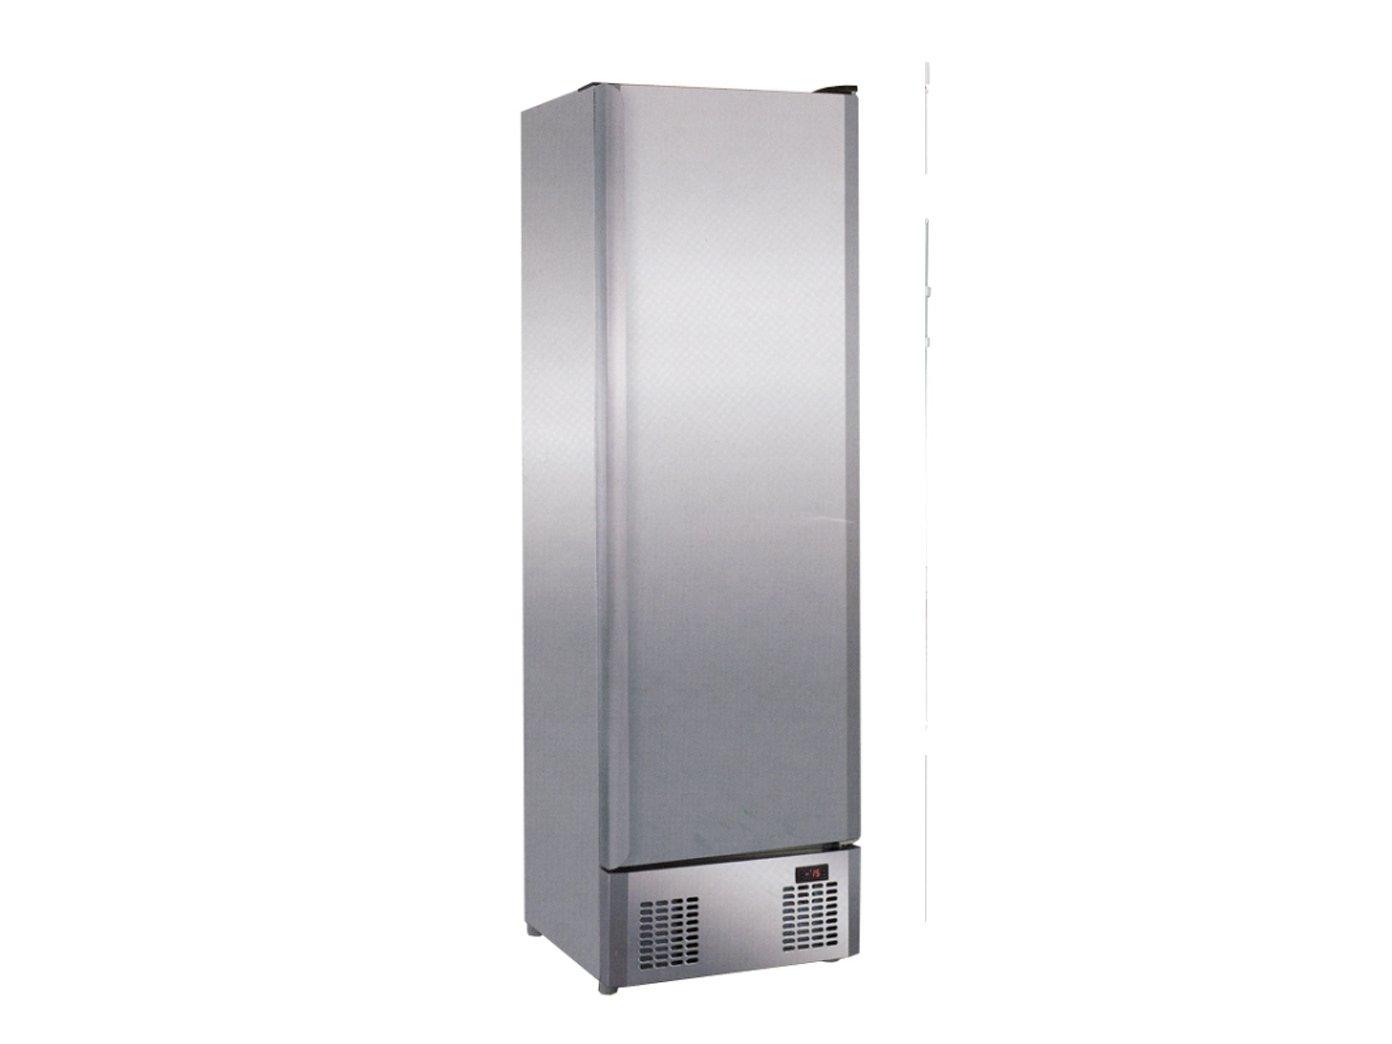 Bomann Kühlschrank Vs 3173 : Profi edelstahl kühlschrank 360 liter statische kühlung 2° c 8